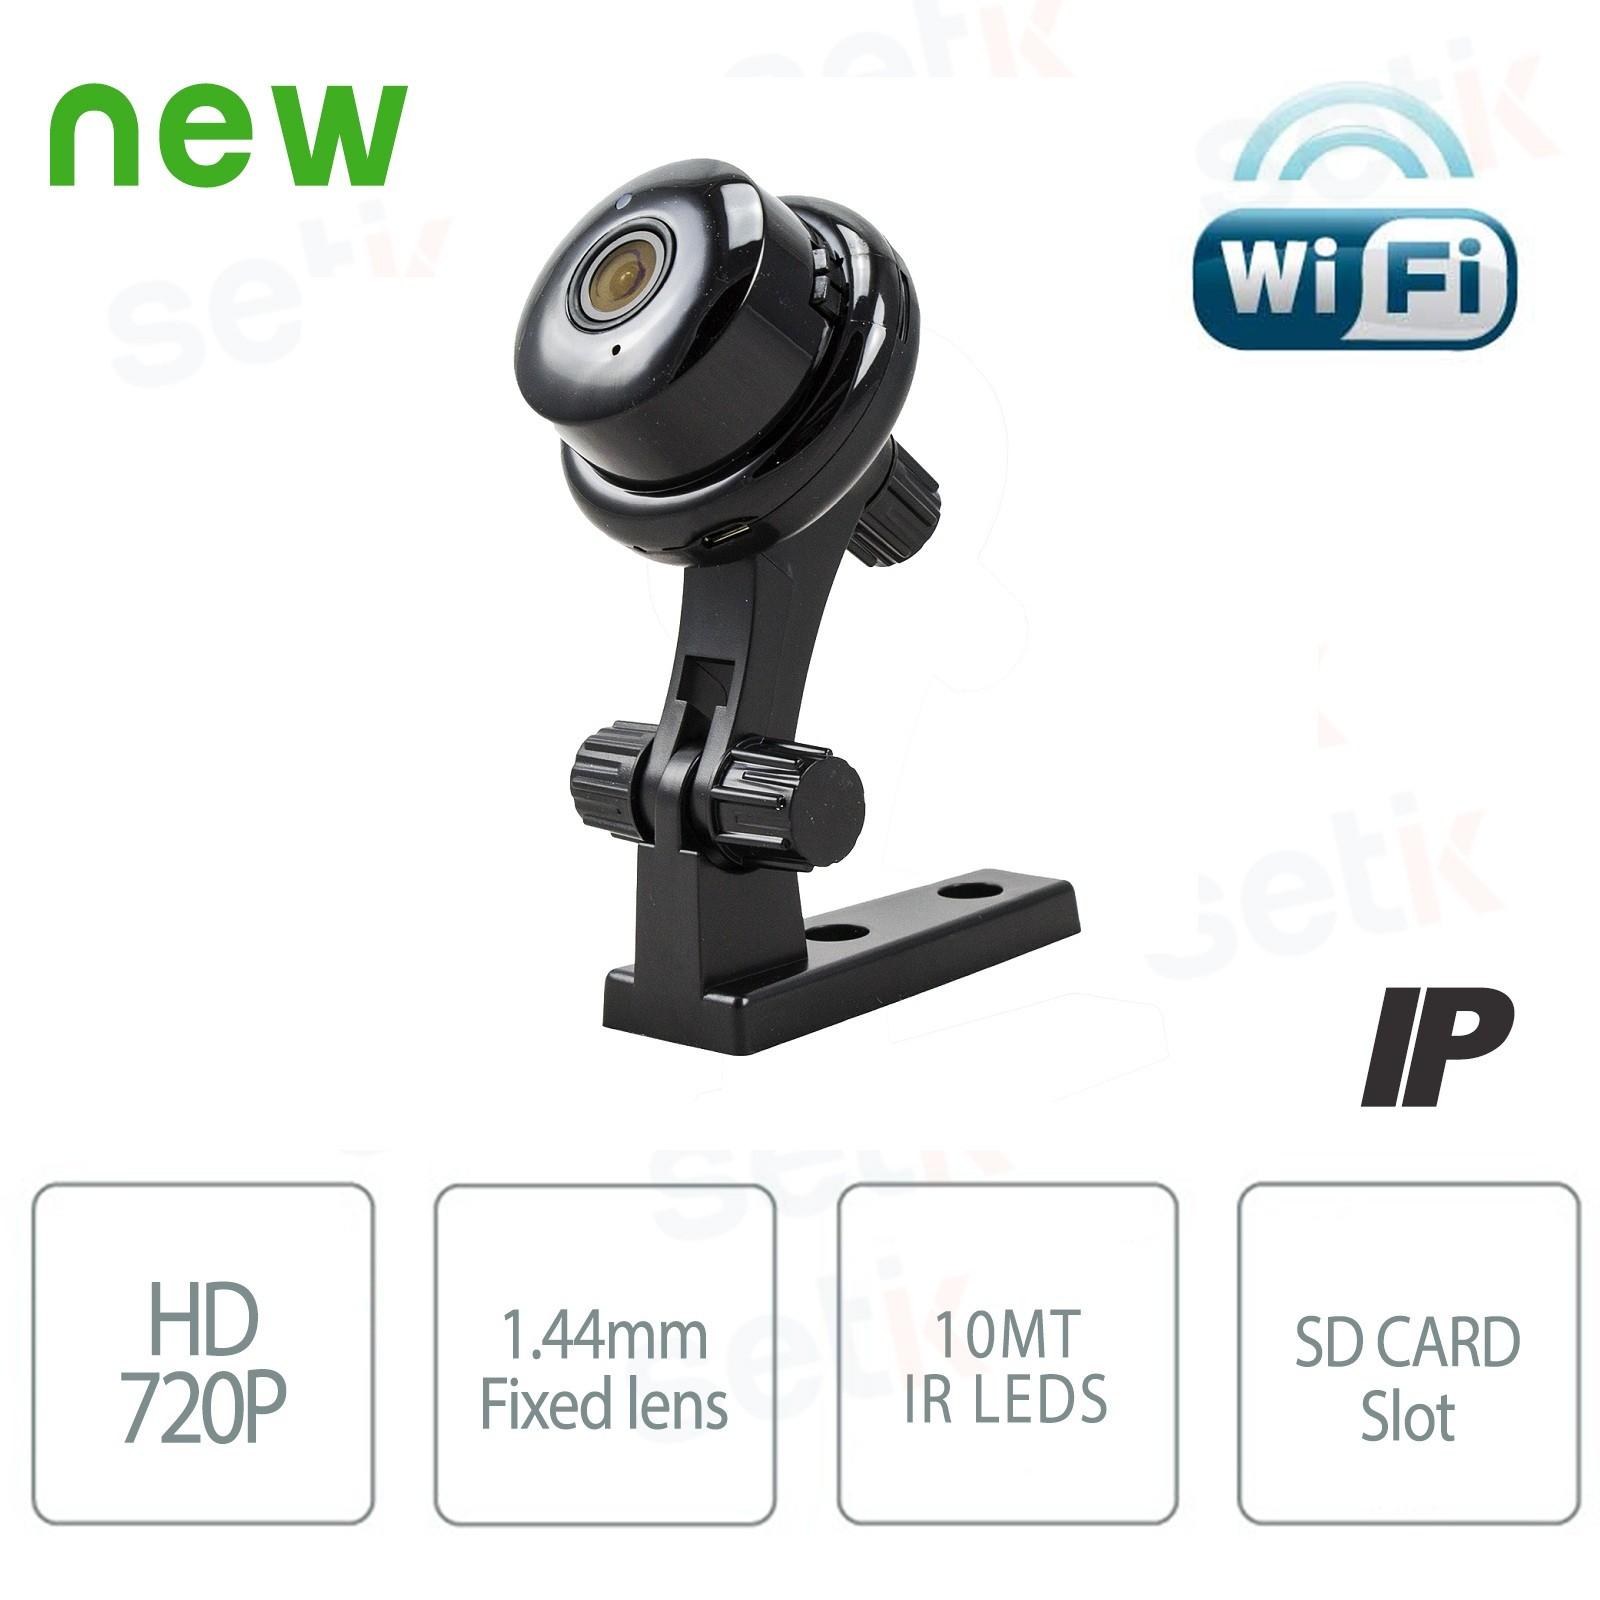 Hdipbutt 360w telecamera nascosta ip spy cam hd wifi for Bentel absoluta manuale installatore